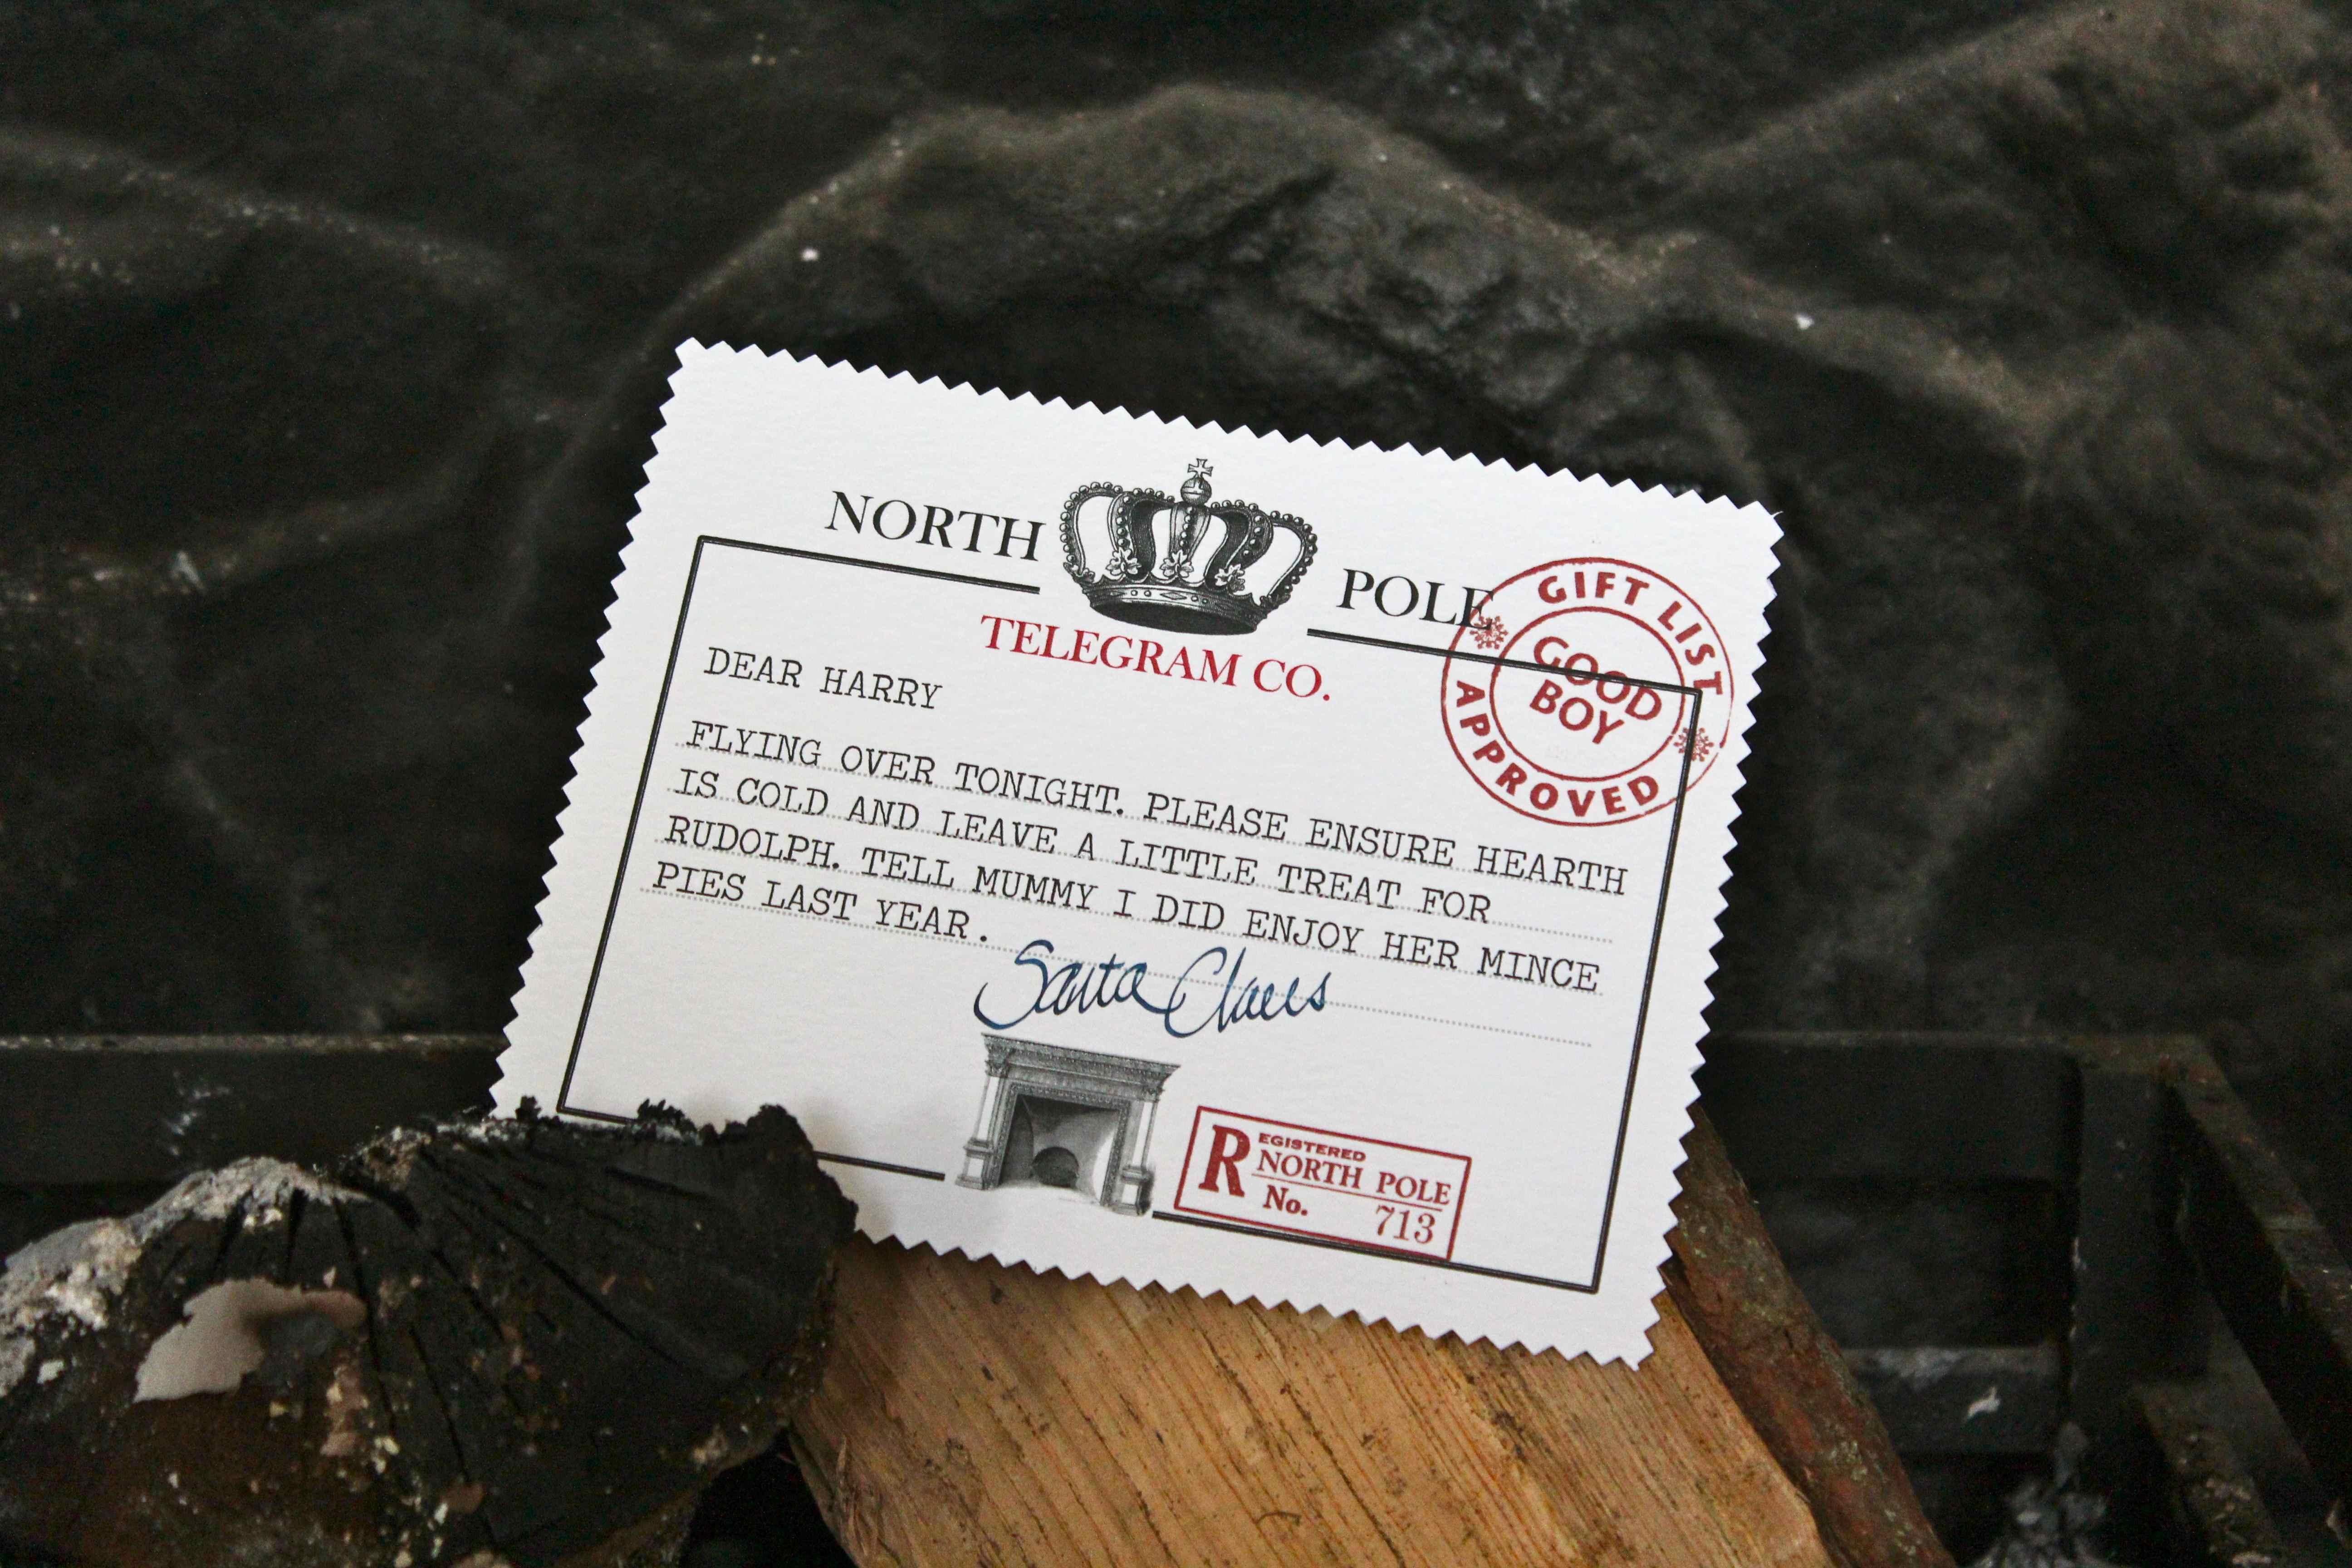 Printable north pole telegram north pole telegram in the grate spiritdancerdesigns Choice Image